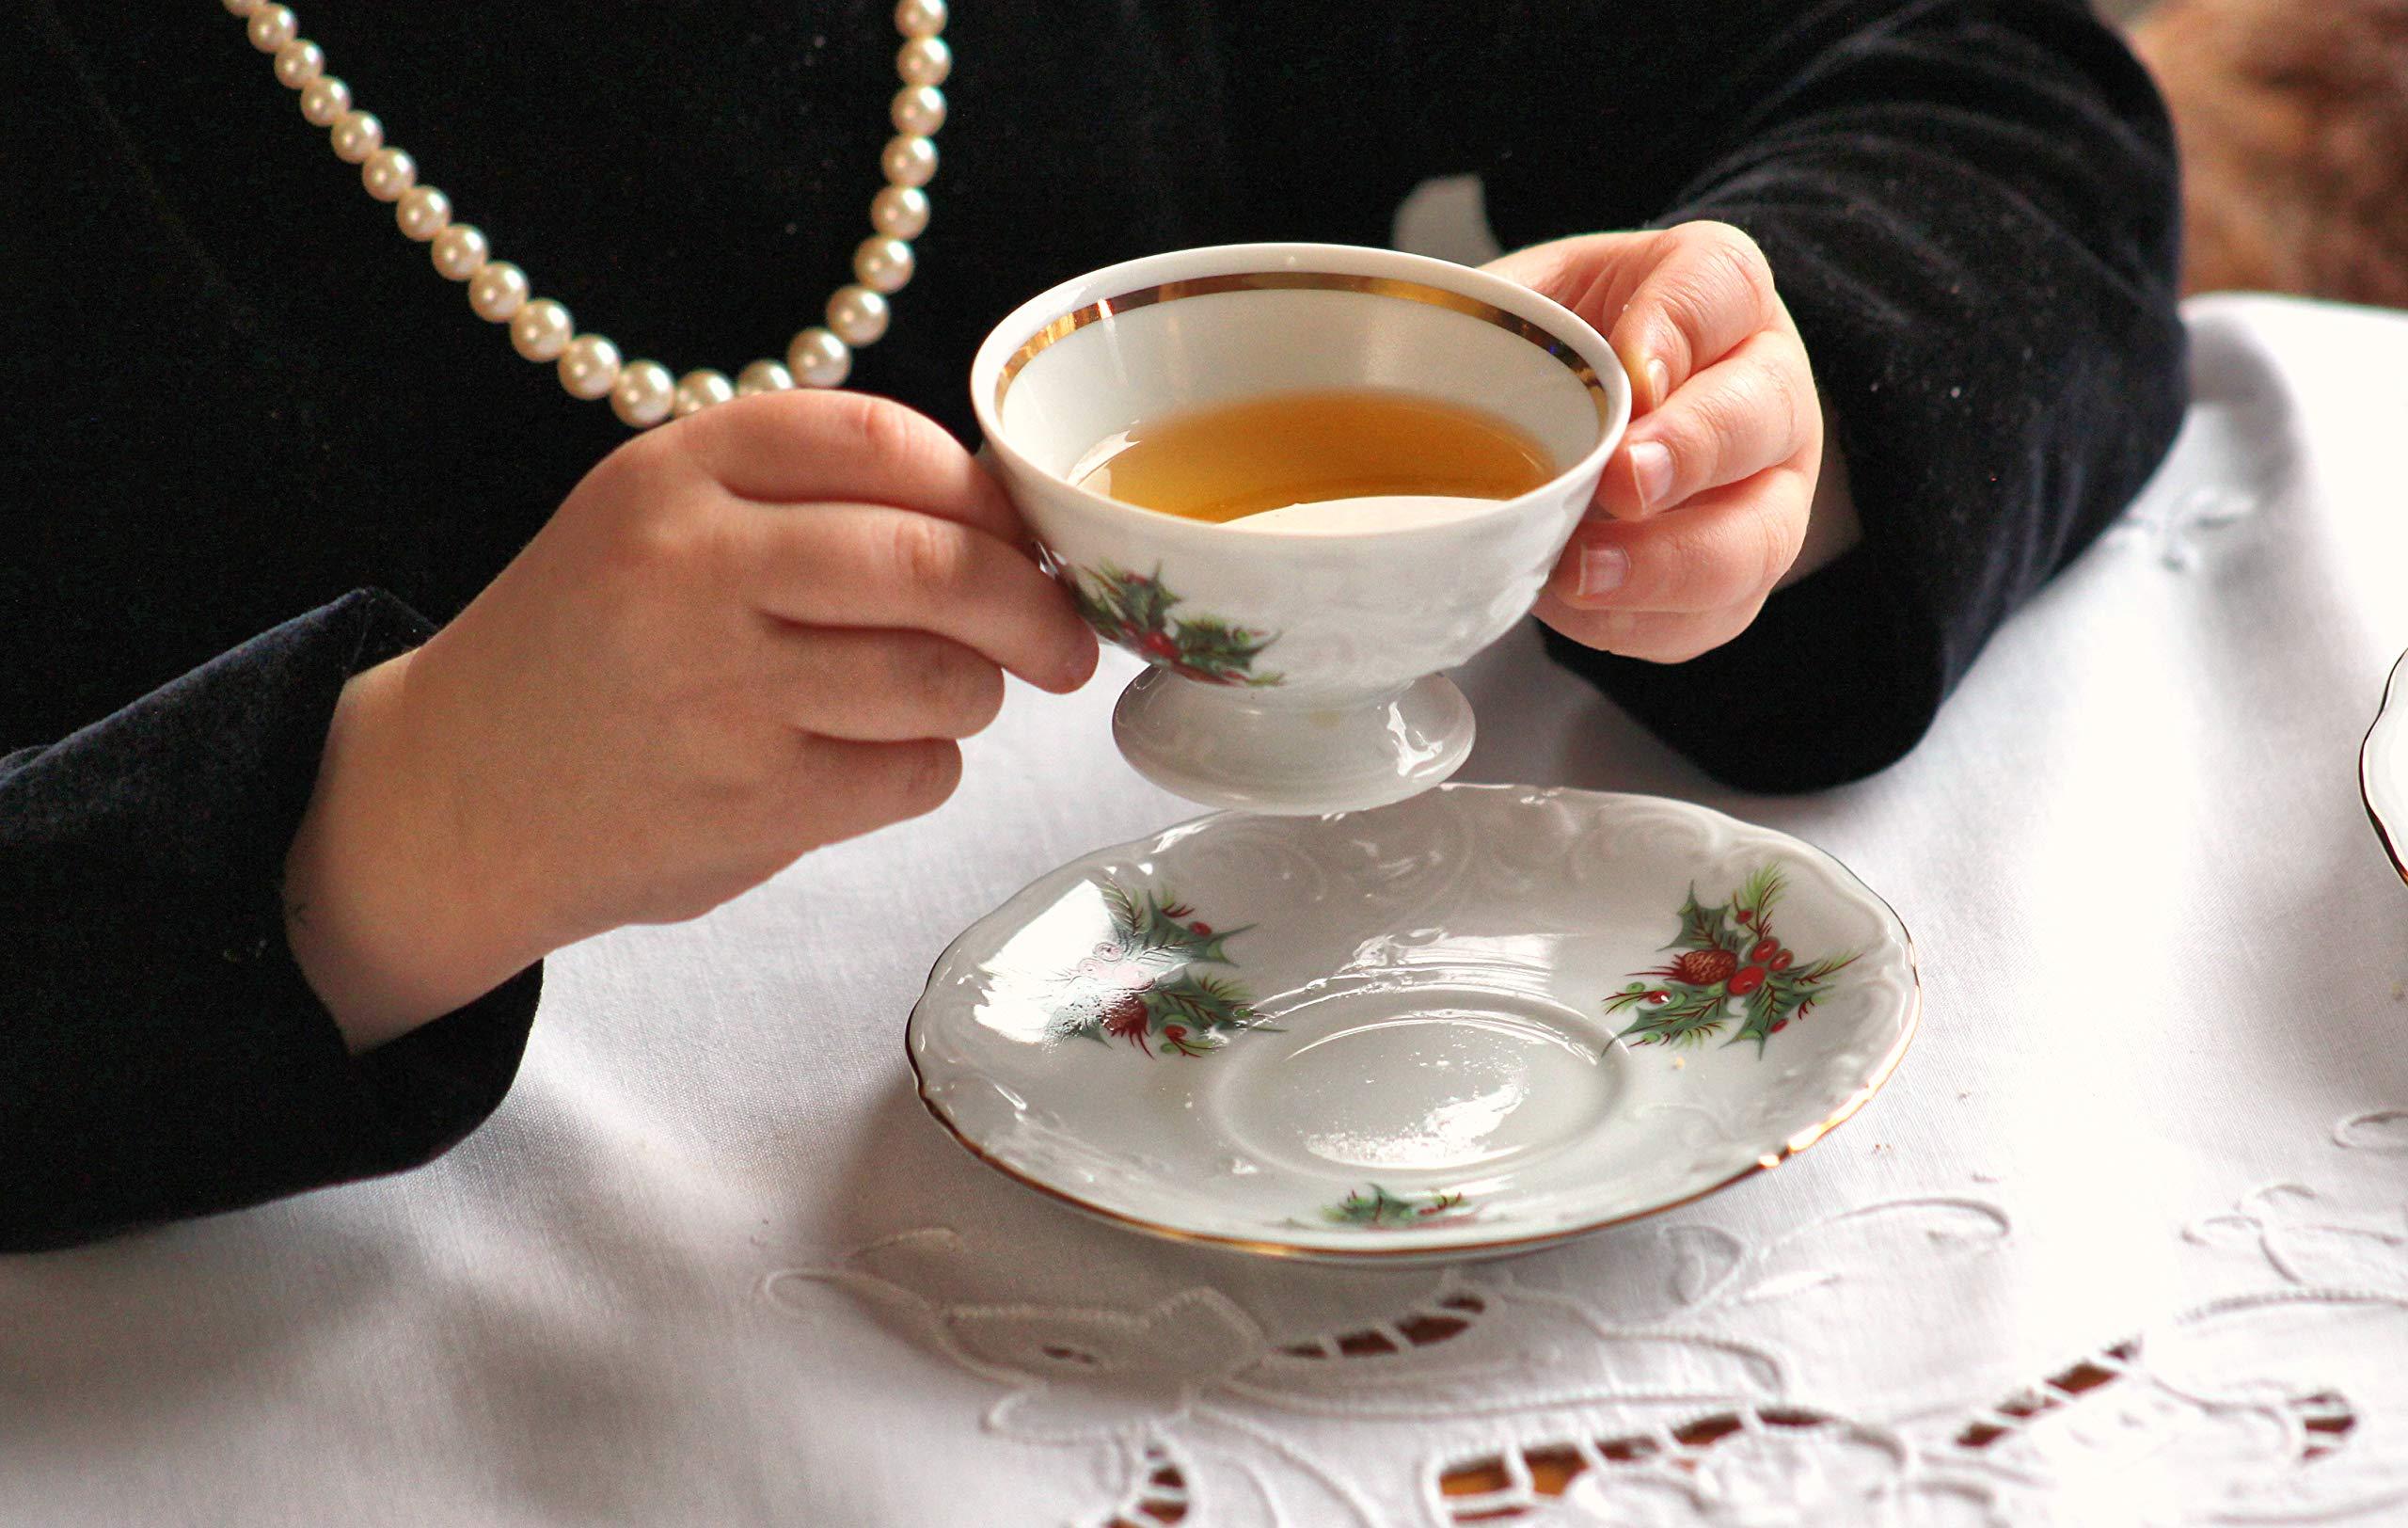 Wawel Tea with Grace Christmas Berry Fine China Tea Set for Children by Wawel (Image #6)